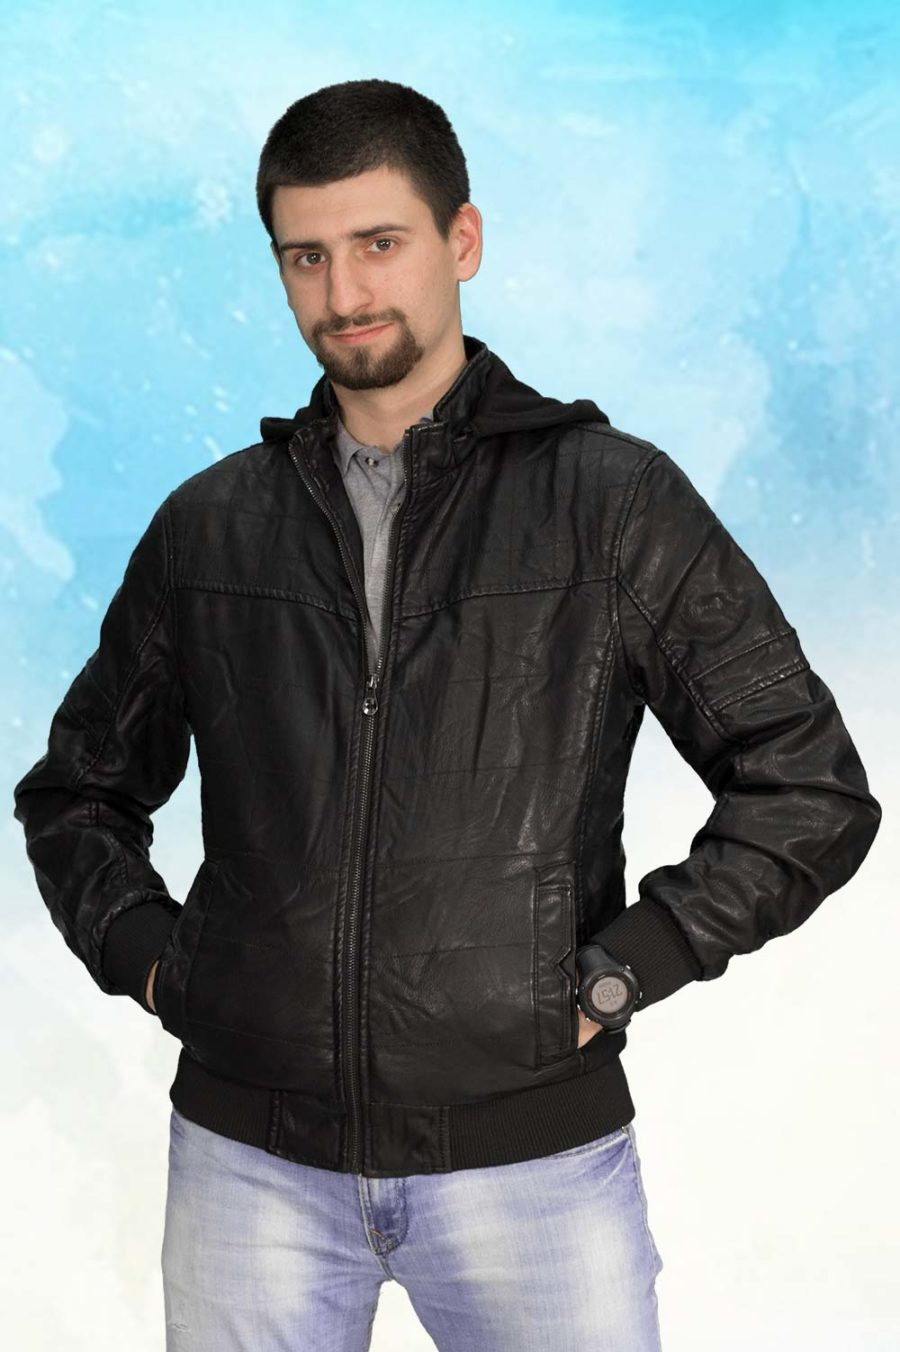 Muška prolećna jakna - Sportska i Casual - ALN 52156 - Crna